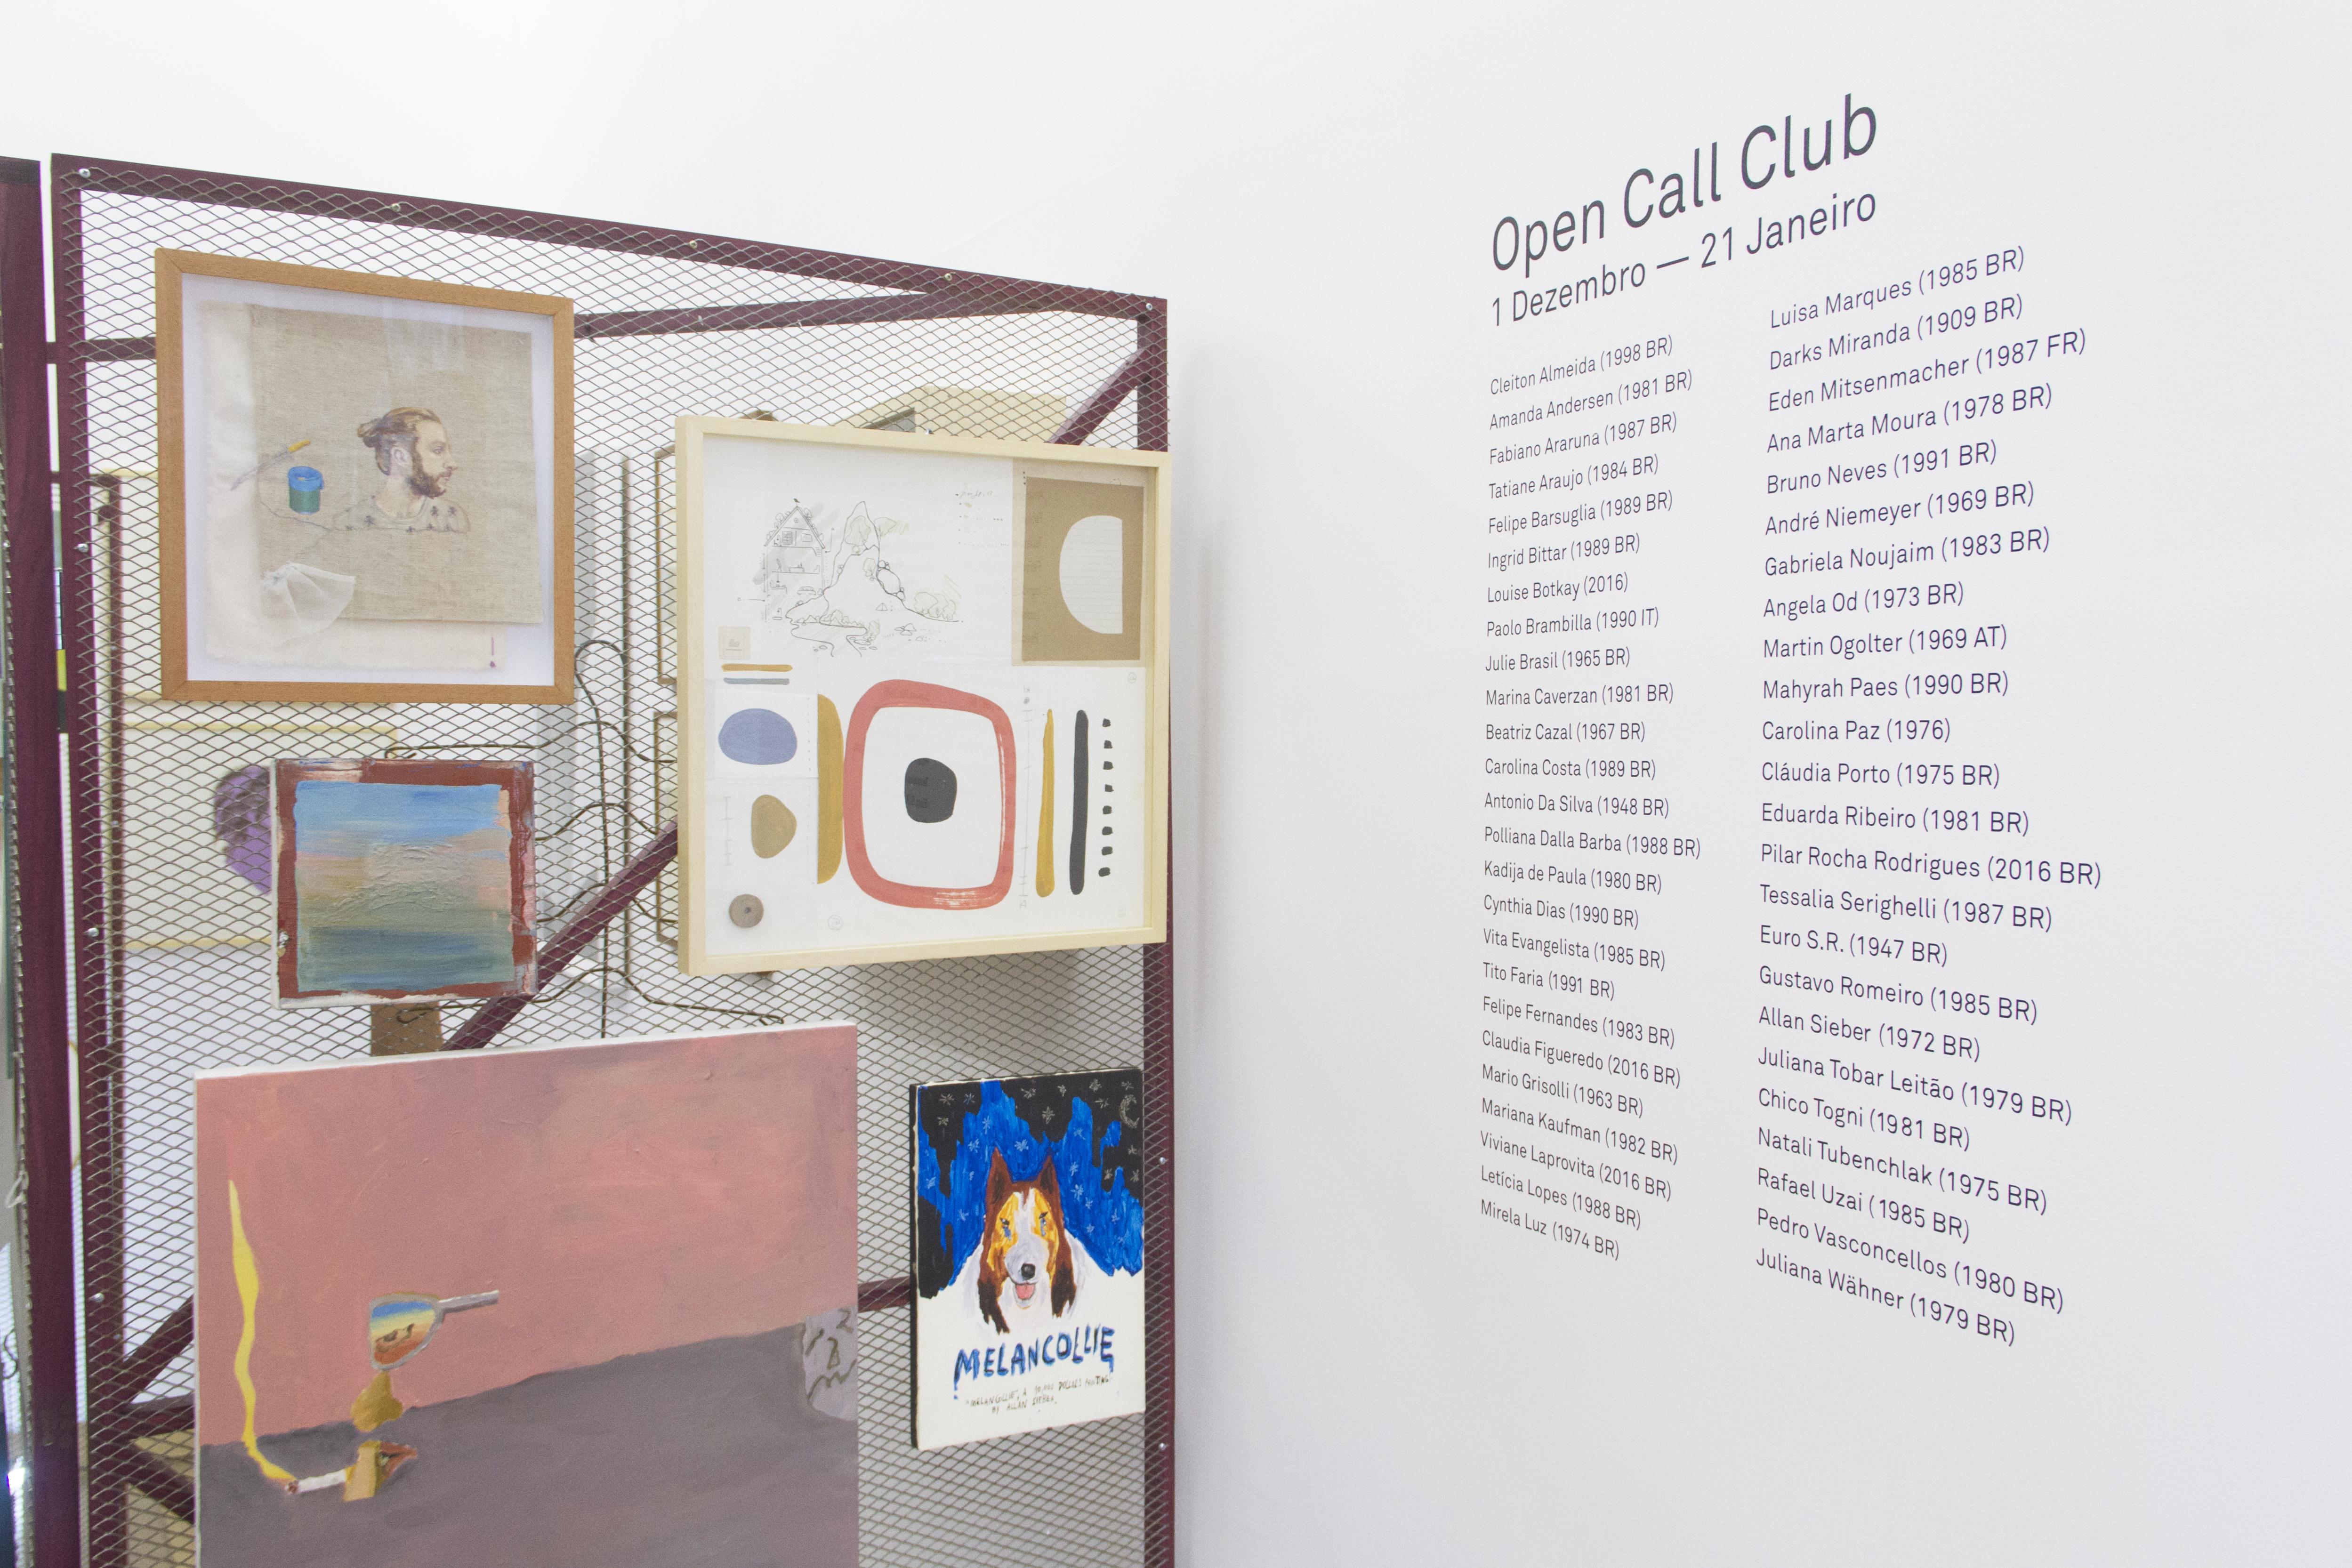 Jonas Lund Open Call Club